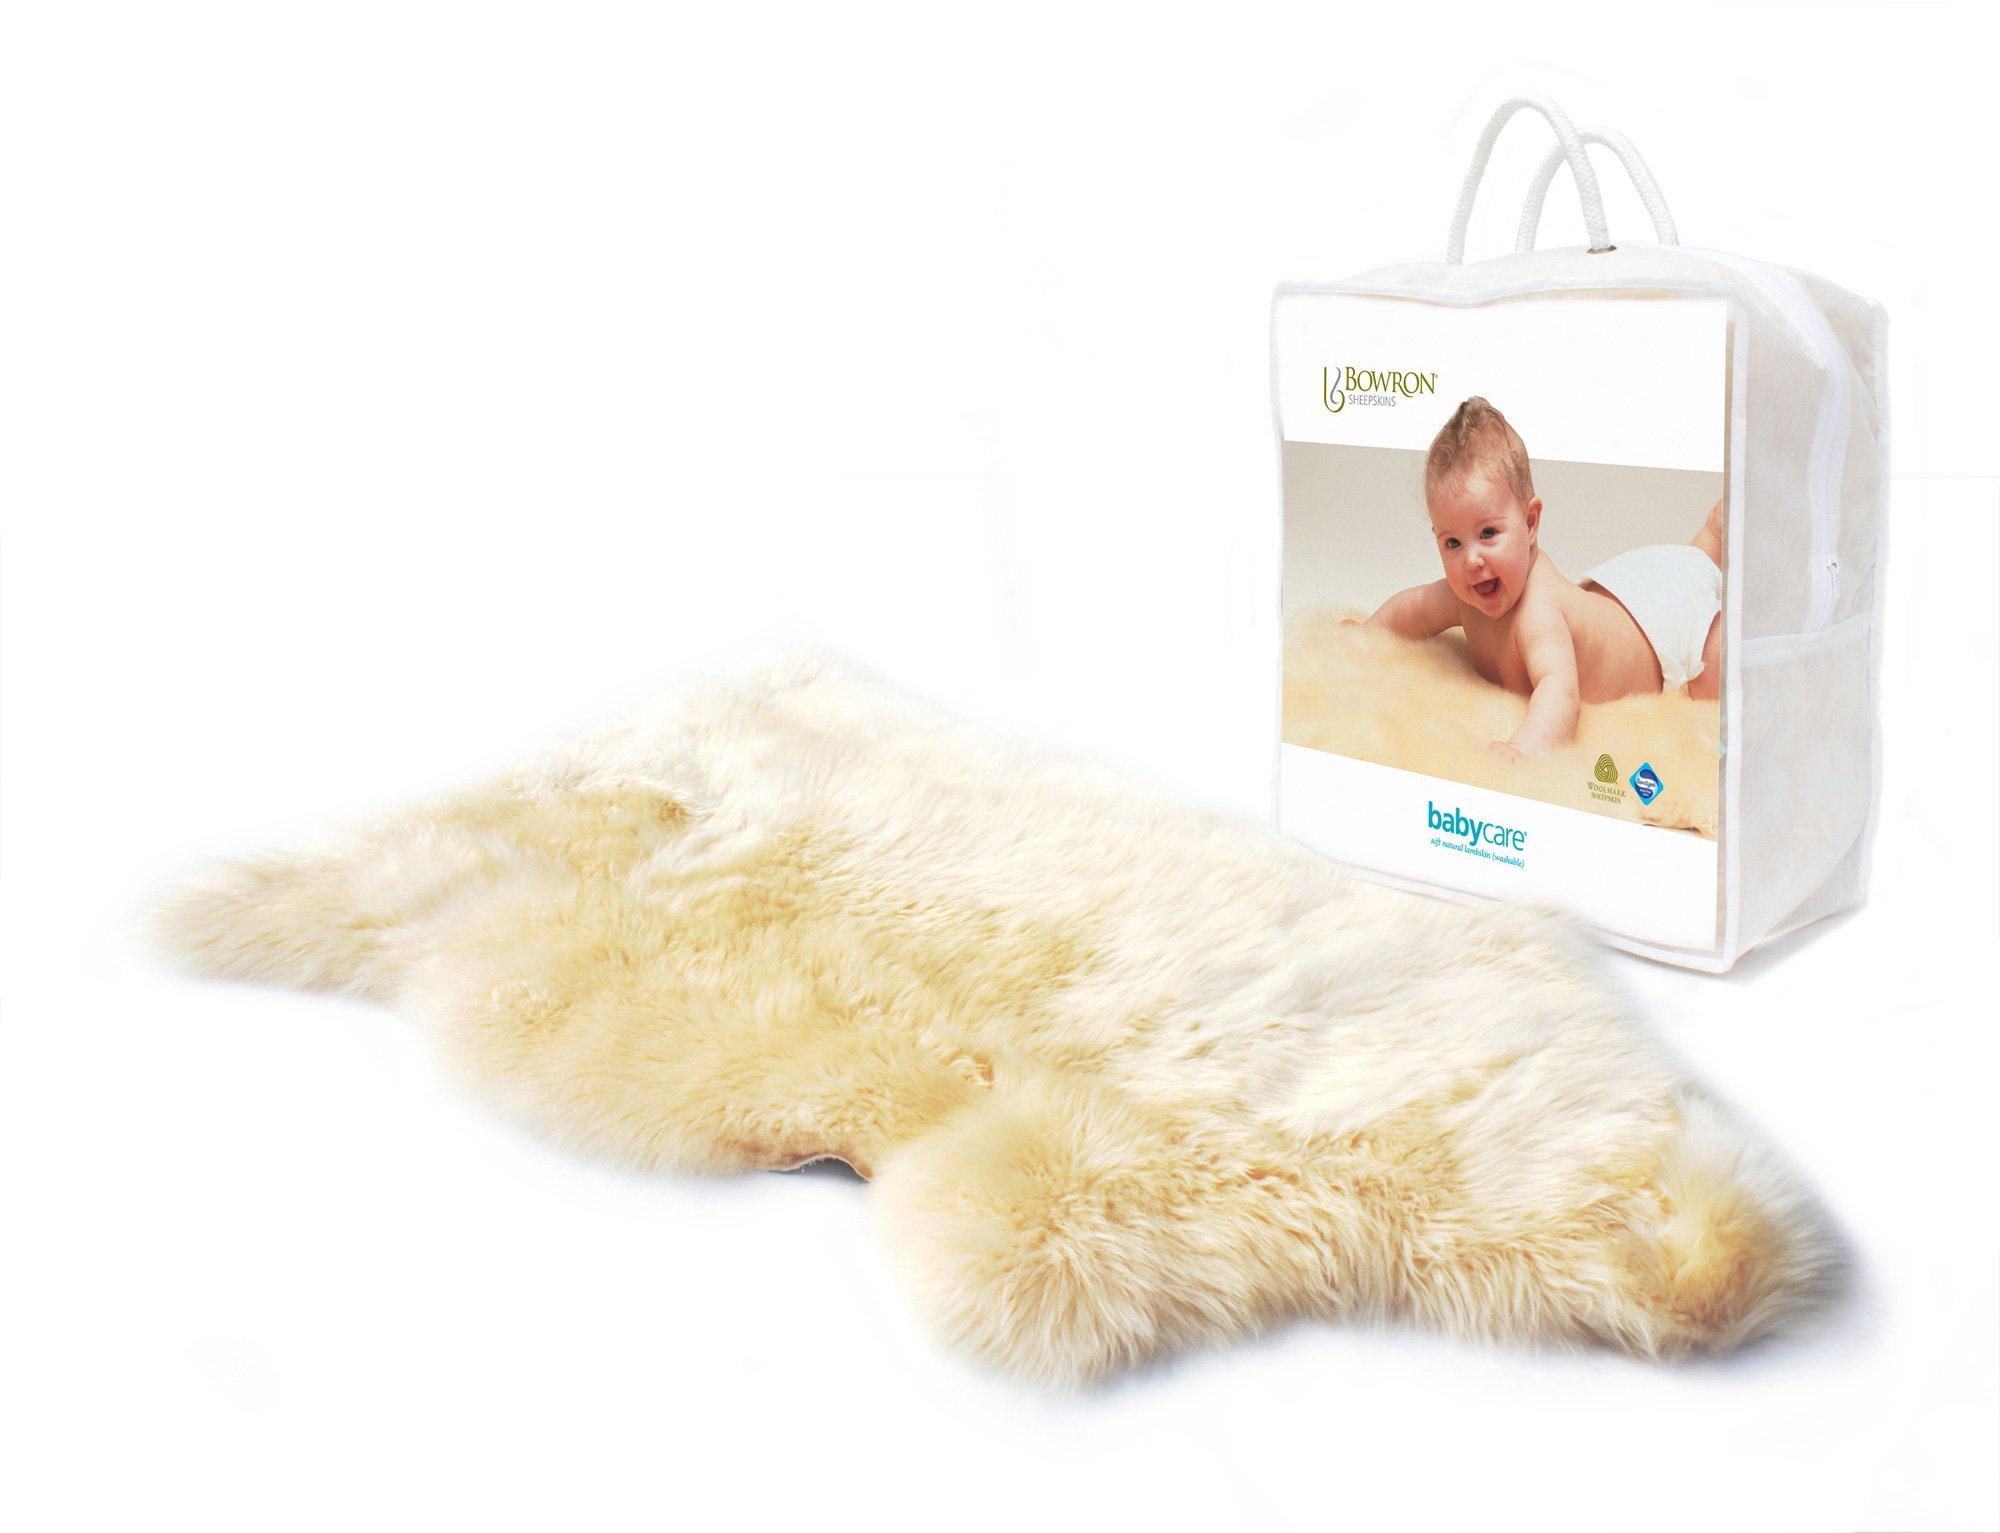 Sheepskins Natural Baby Blanket / Comforter - Unshorn Bowron Sheepskin Blanket